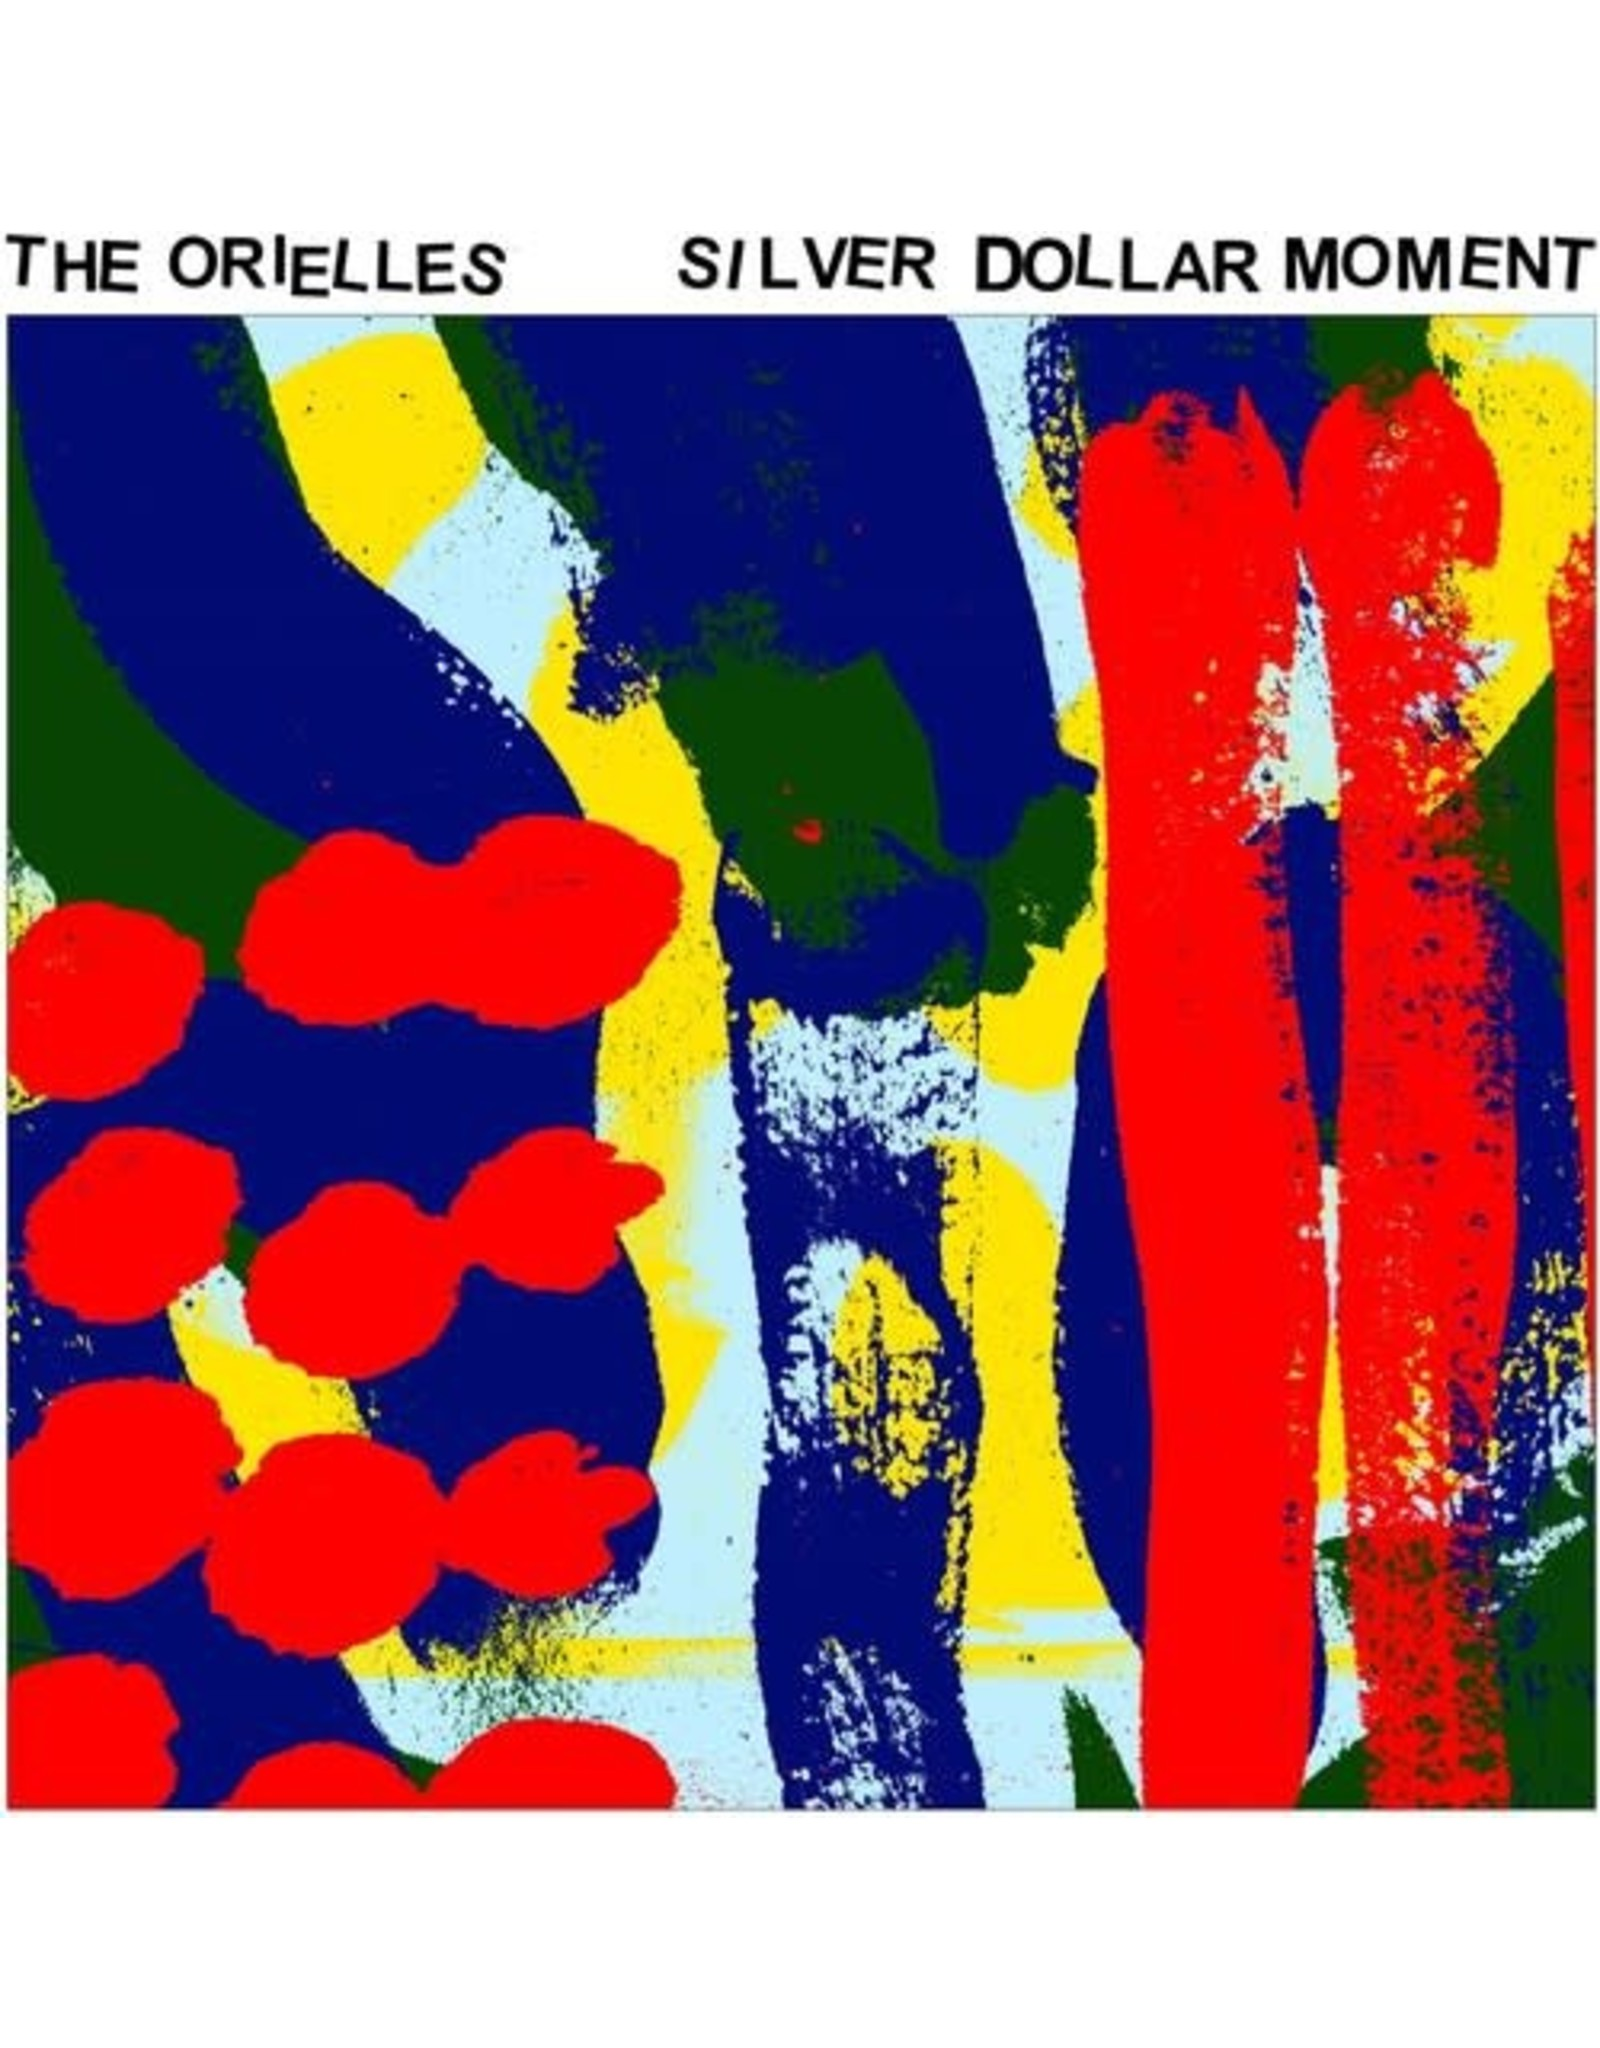 New Vinyl The Orielles - Silver Dollar Moment LP